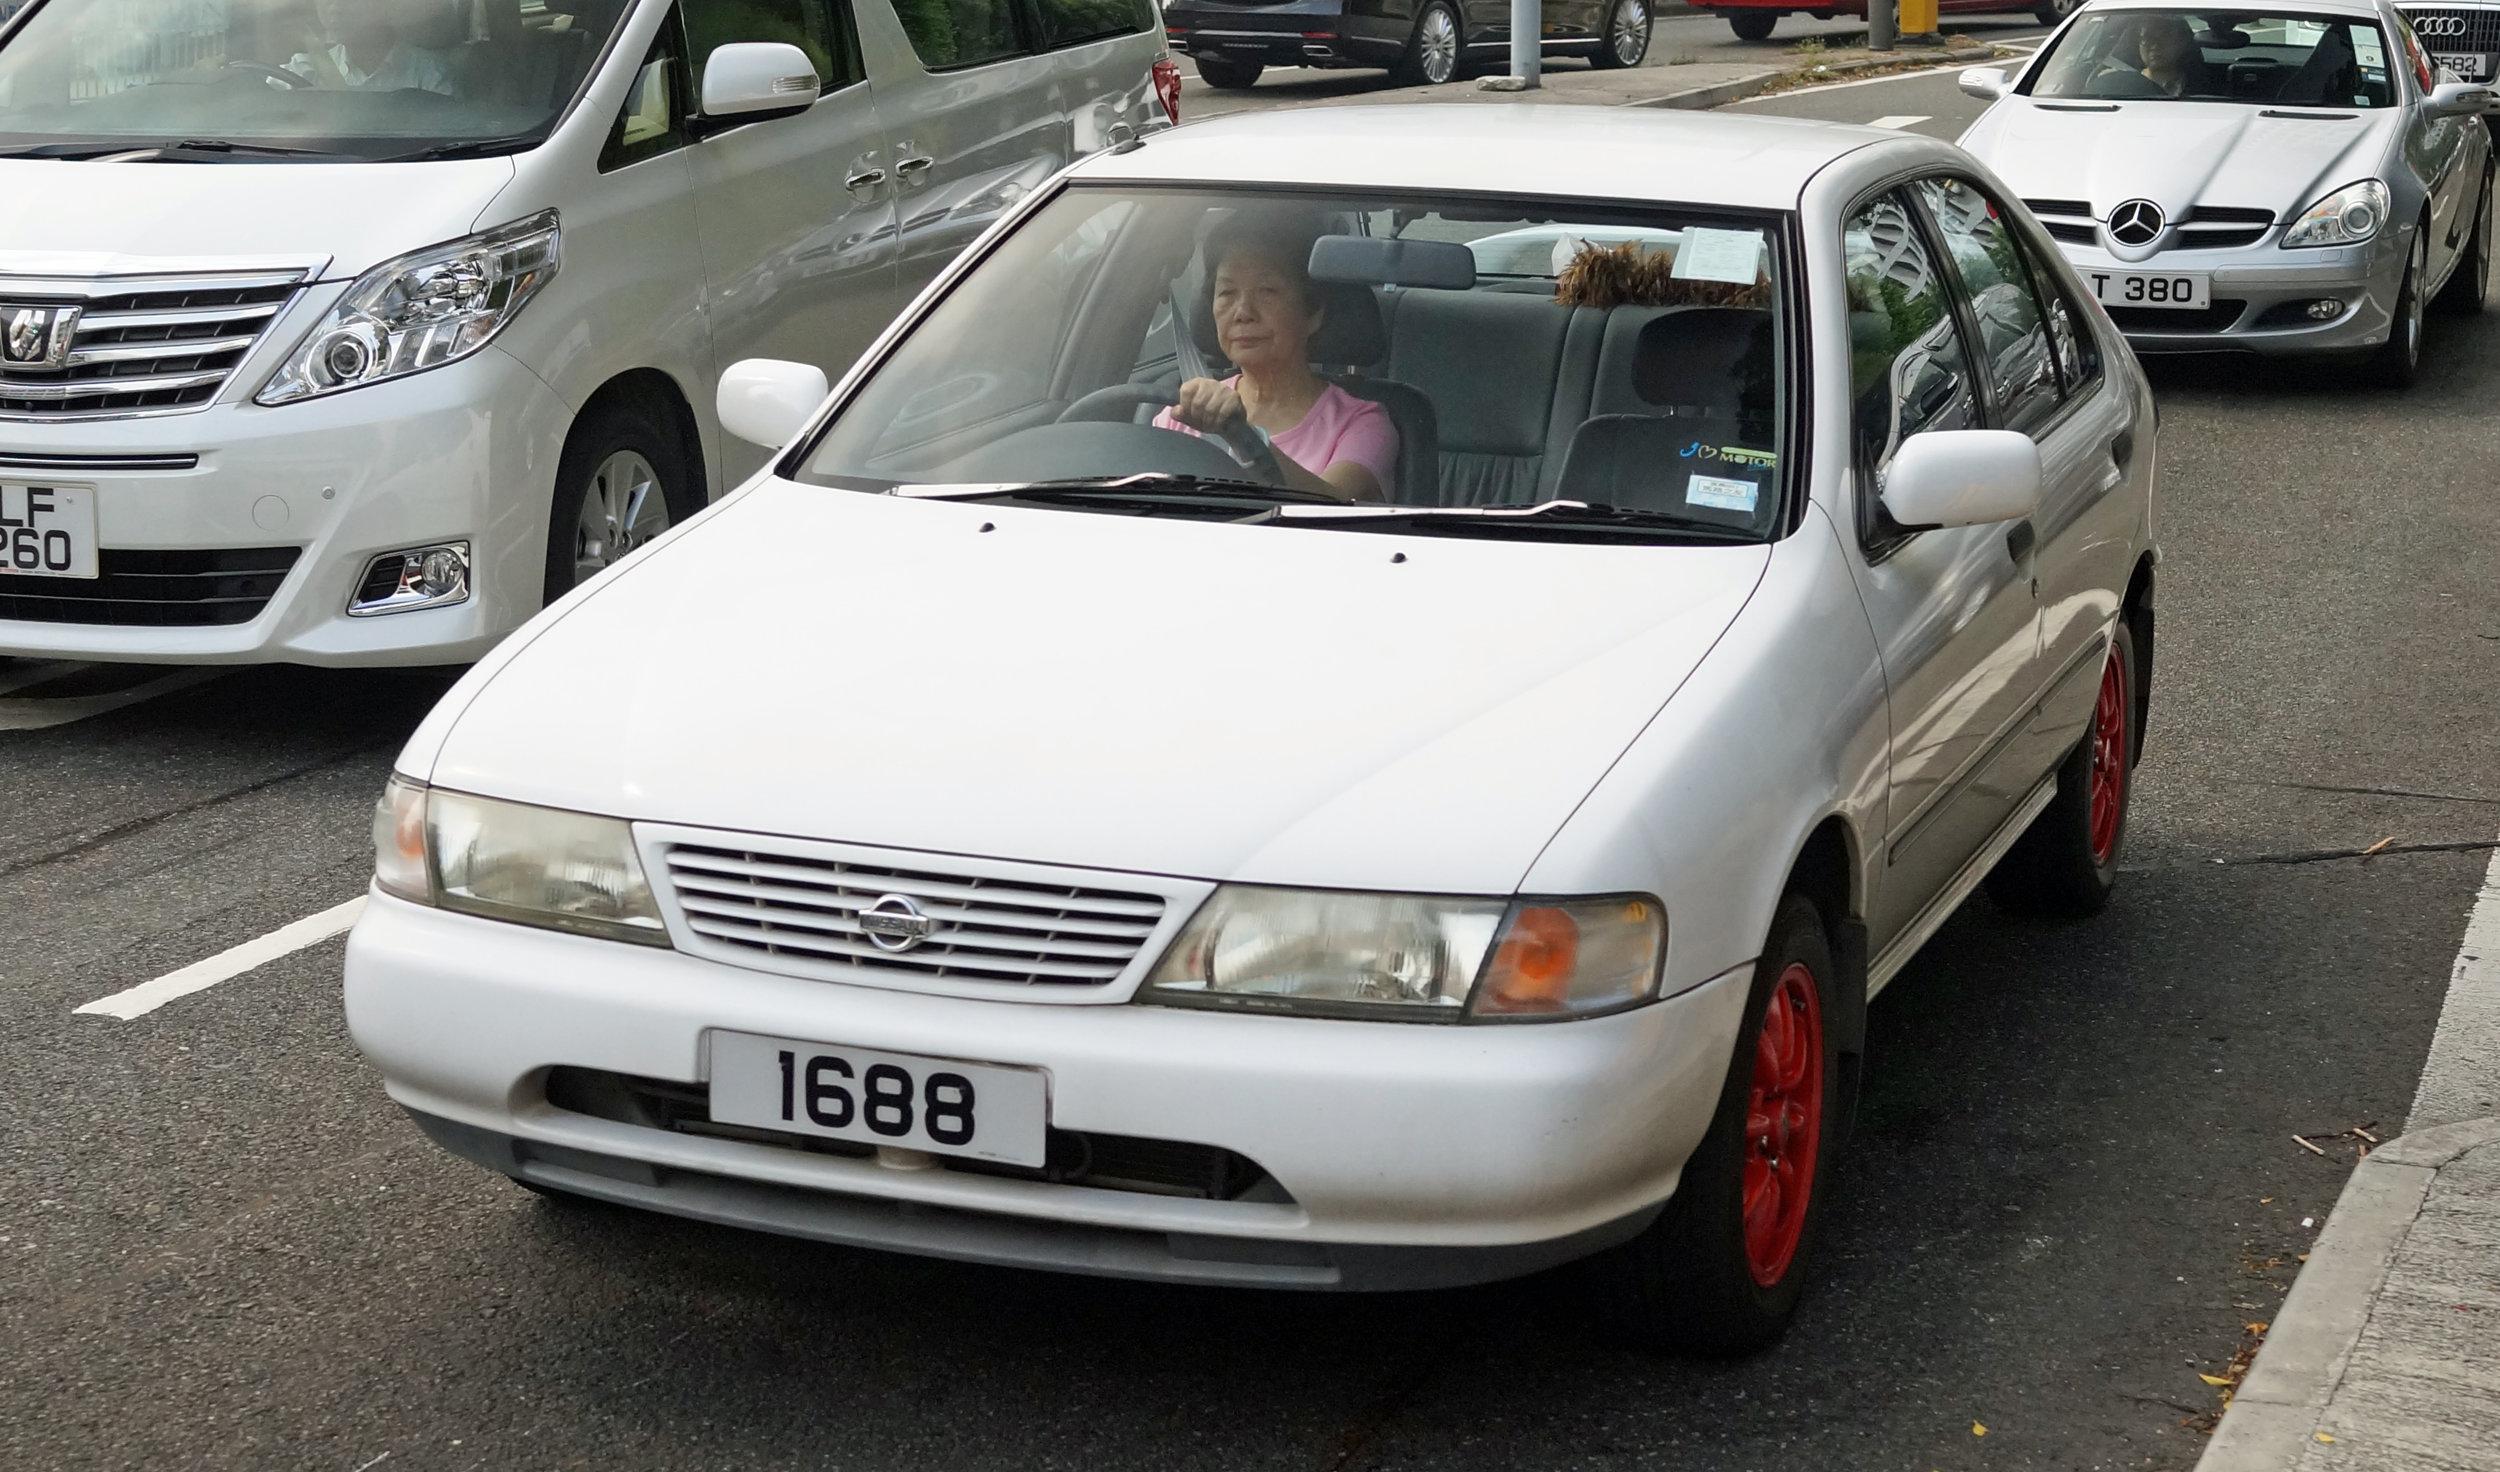 Car Number Plate - No. 1688.jpg